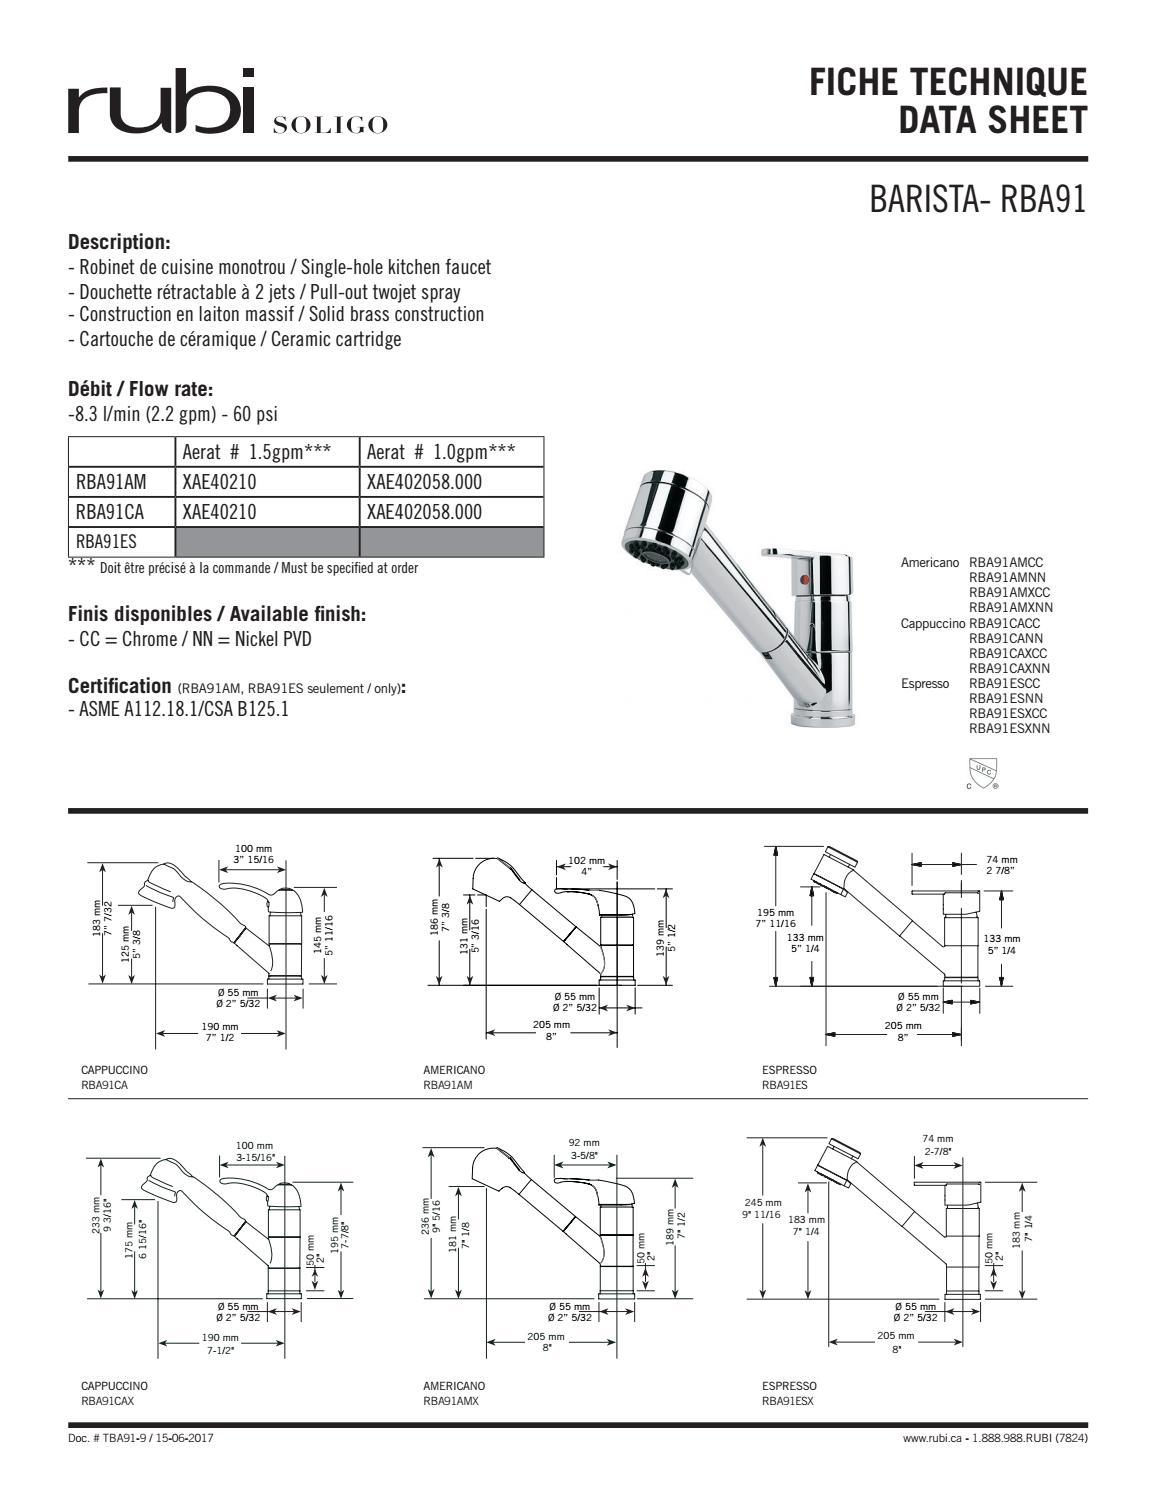 Tba91 8 Fiche Technique Data Sheet By Rubi Soligo 2 Issuu